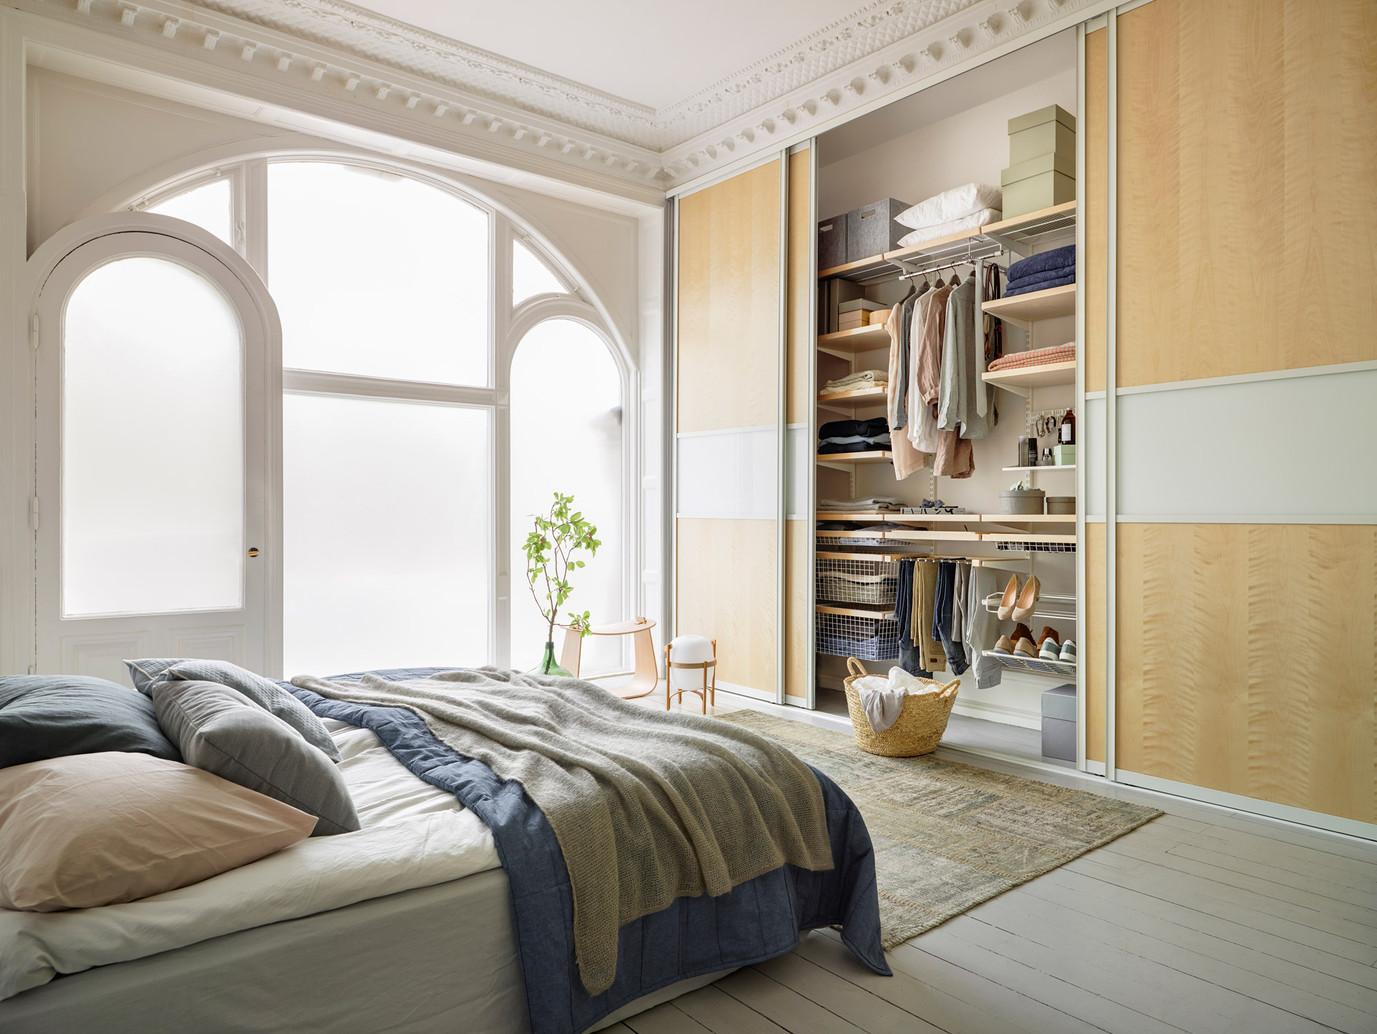 Elfa_Sliding-doors_Artic_Interior_Decor-